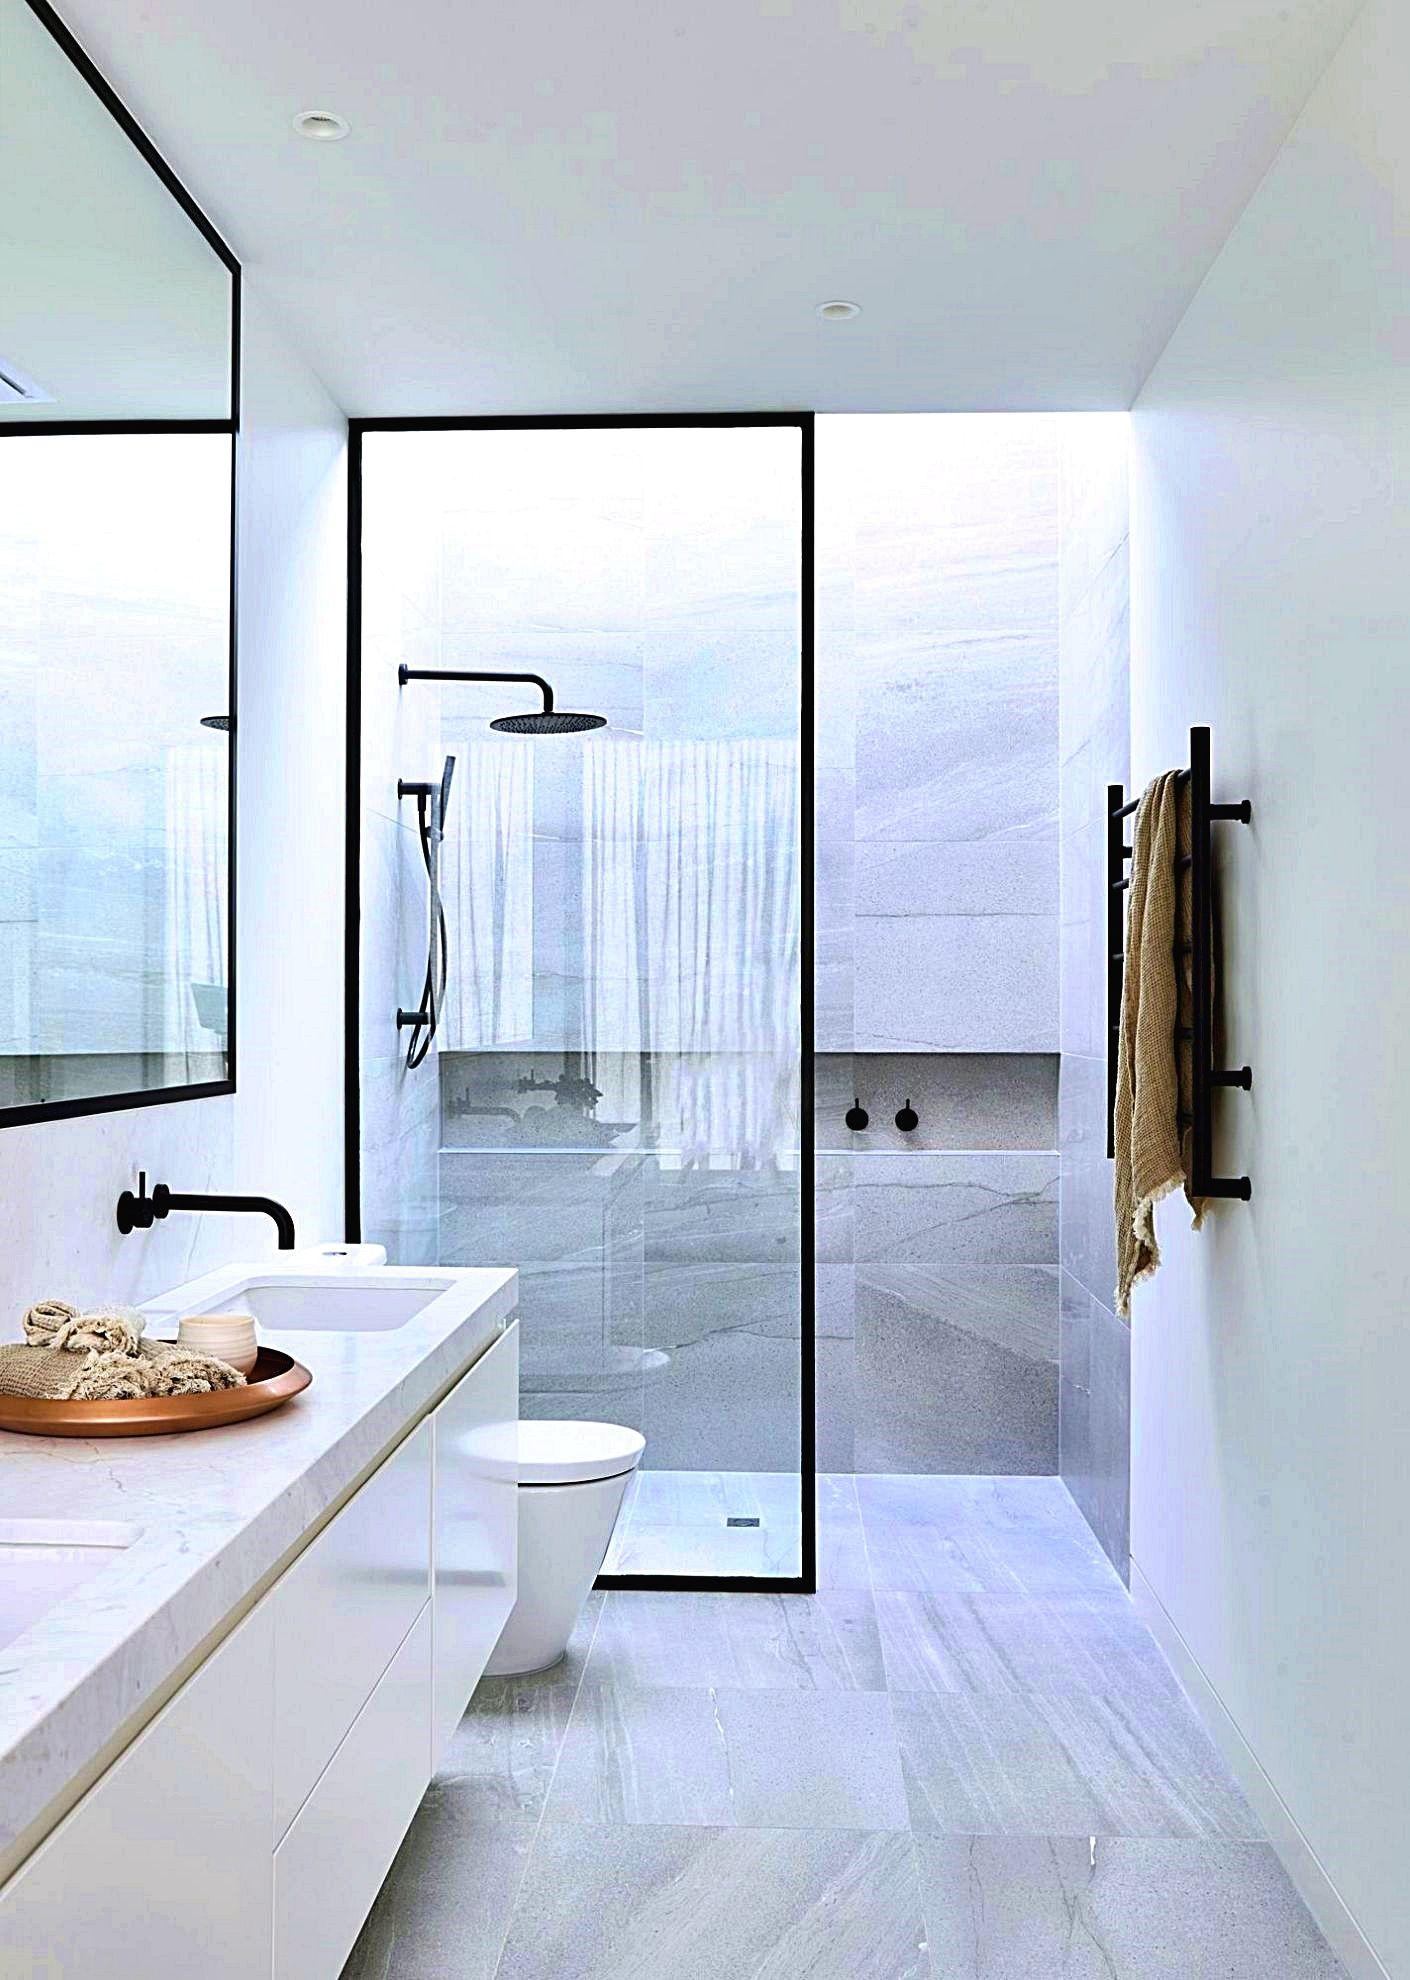 10 Glitzy And Glorious Bathroom Ideas Ideal Home Minimalist Bathroom Design Bathroom Interior Design Minimalist Bathroom Small bathroom ideas ideal home